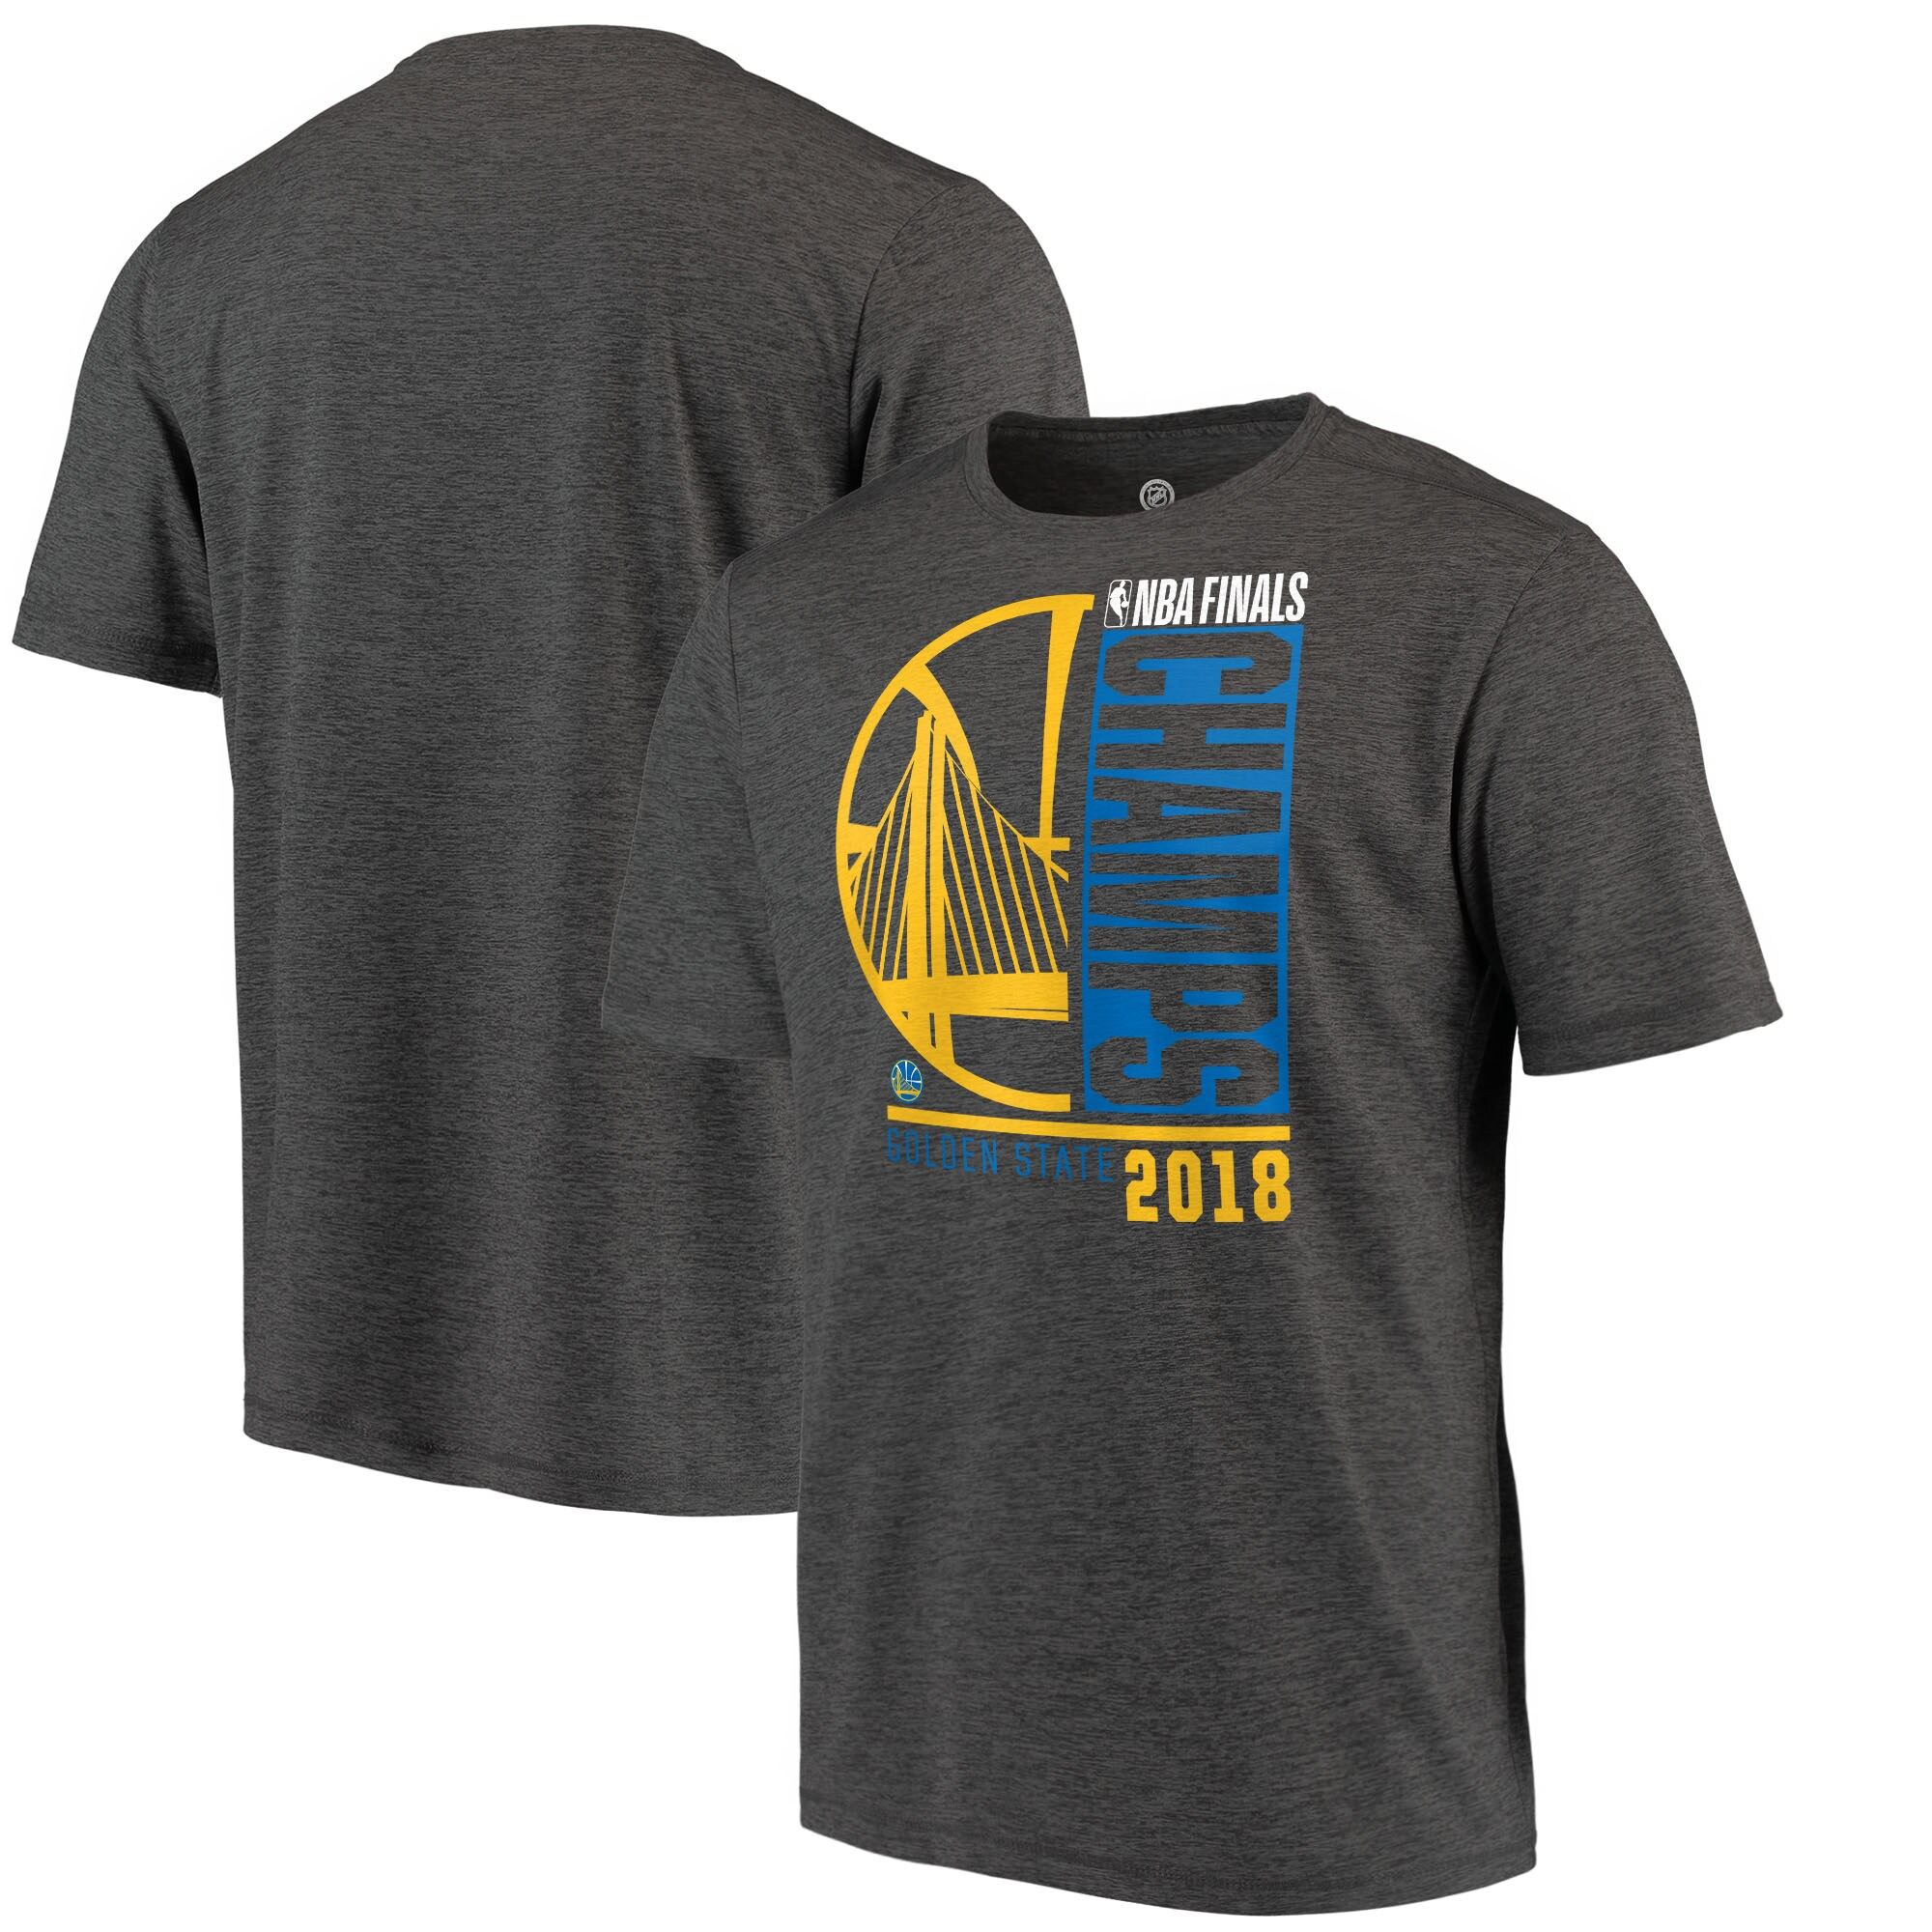 Golden State Warriors Fanatics Branded 2018 NBA Finals Champions Performance T-Shirt - Heather Charcoal